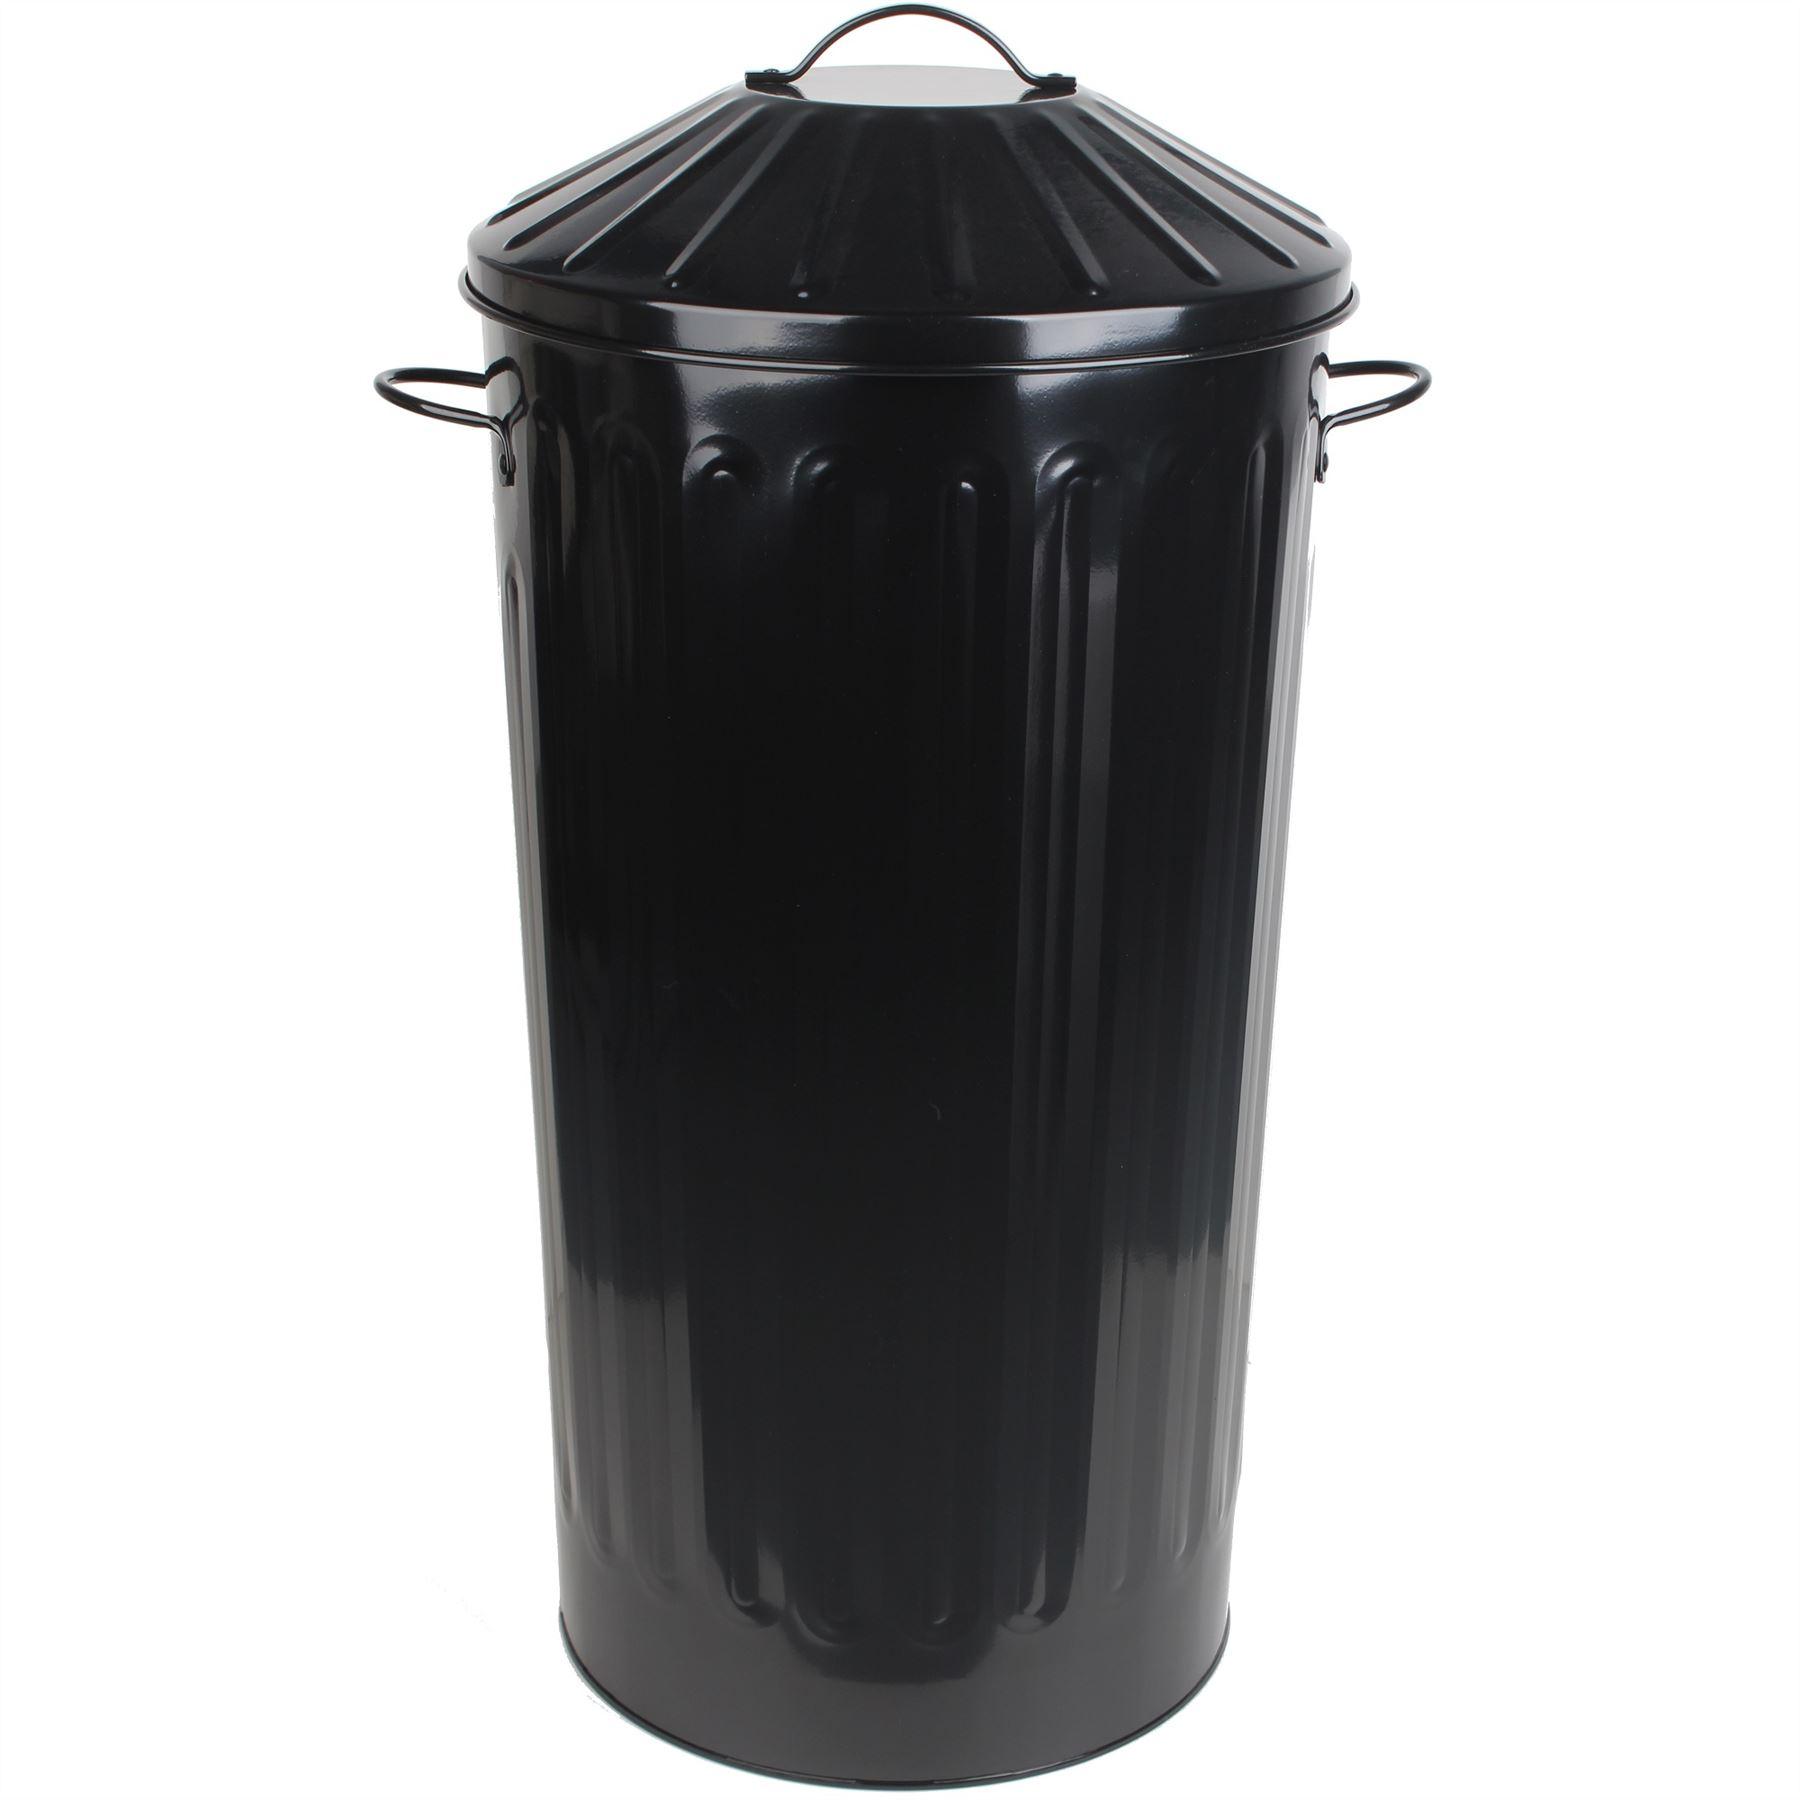 Metal 50 Litre Home Kitchen Colour Recycle Dustbin Rubbish